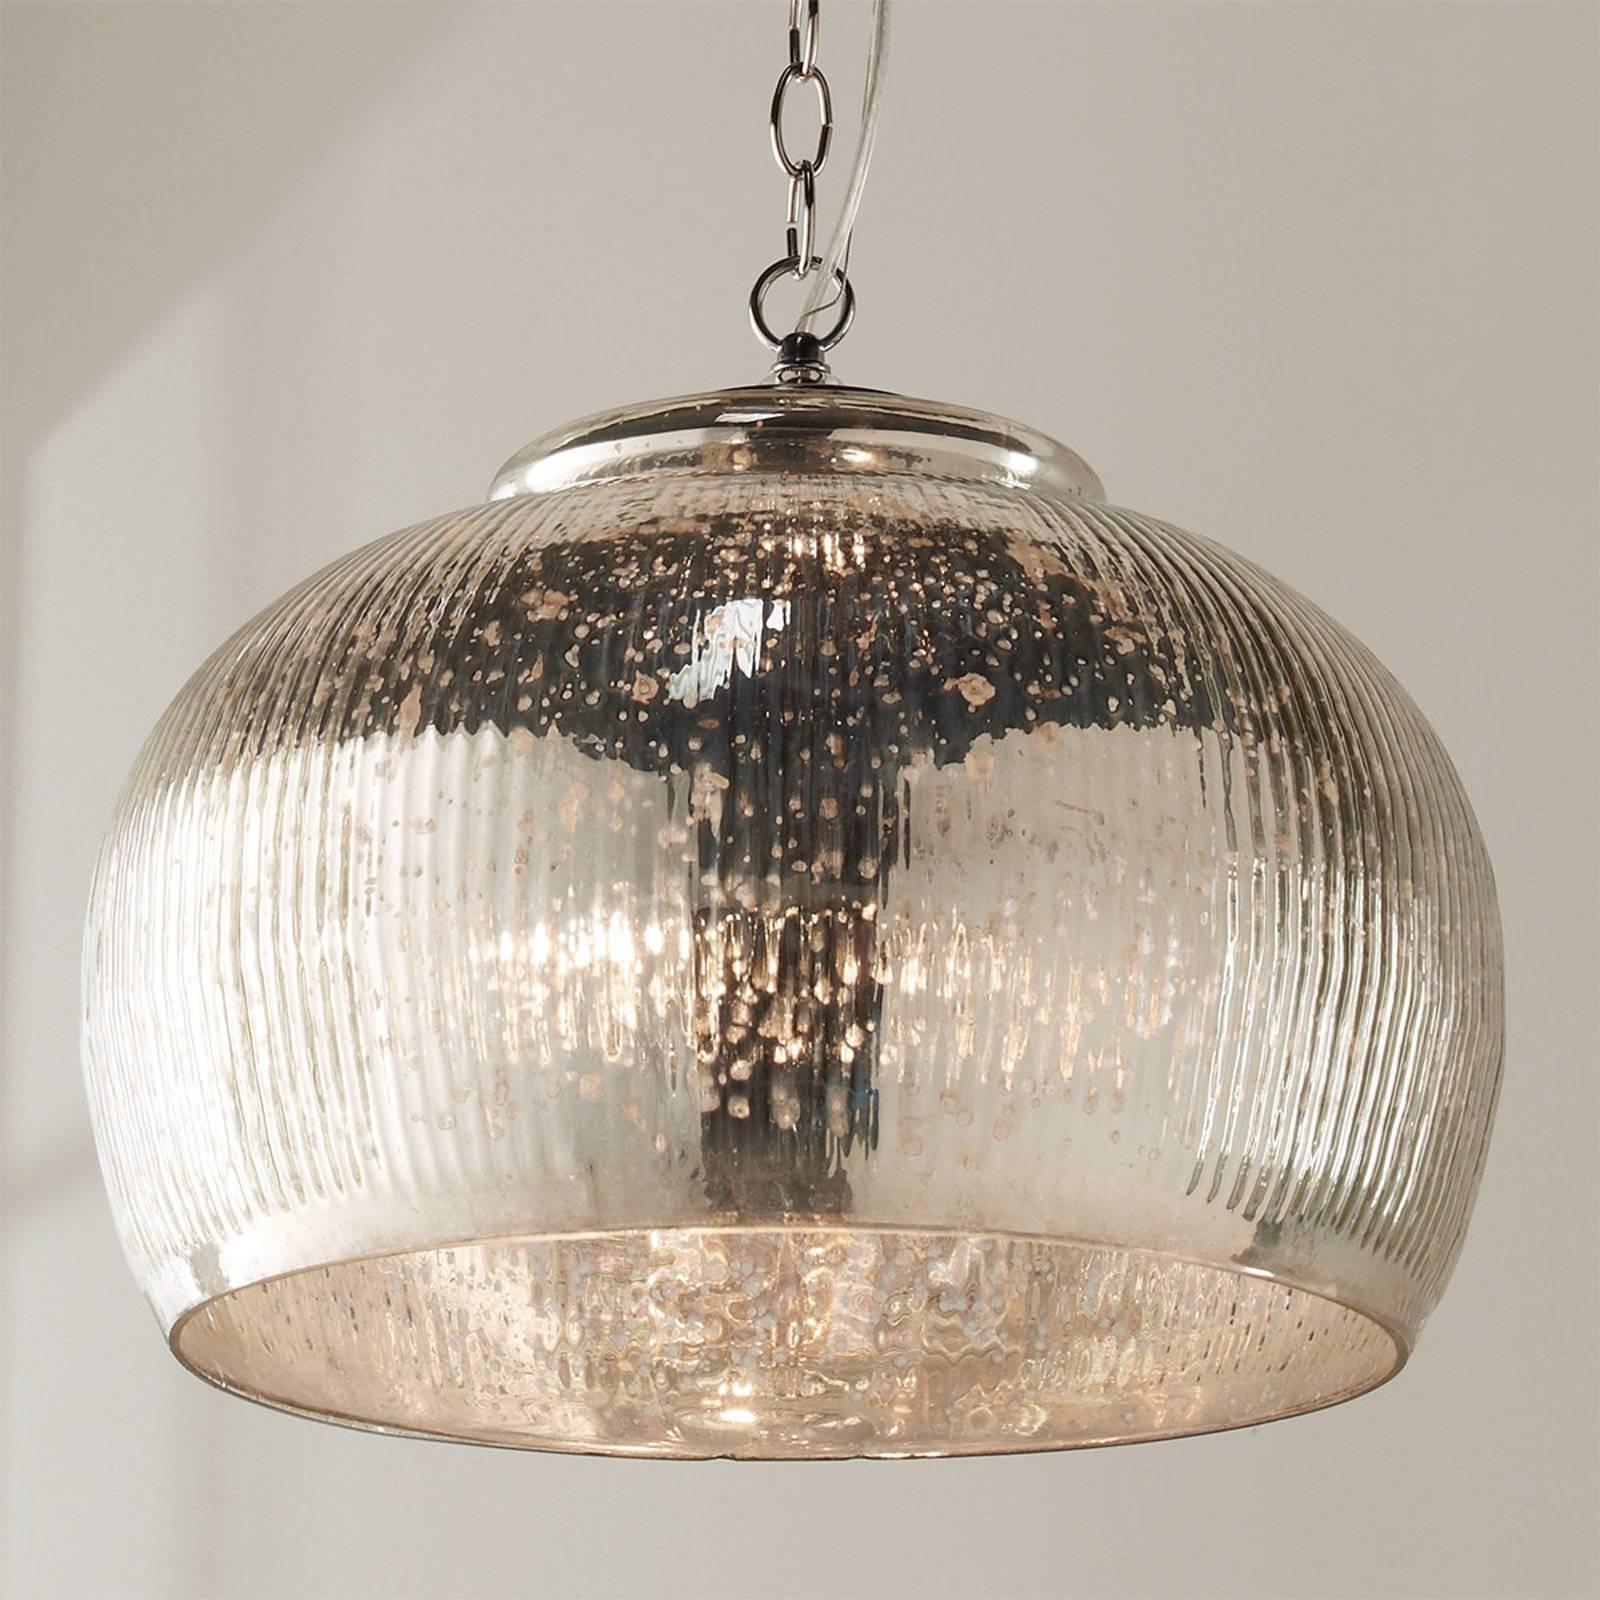 Chandeliers Design : Magnificent Fancy Mercury Glass Light throughout Mercury Glass Pendant Light Fixtures (Image 5 of 15)